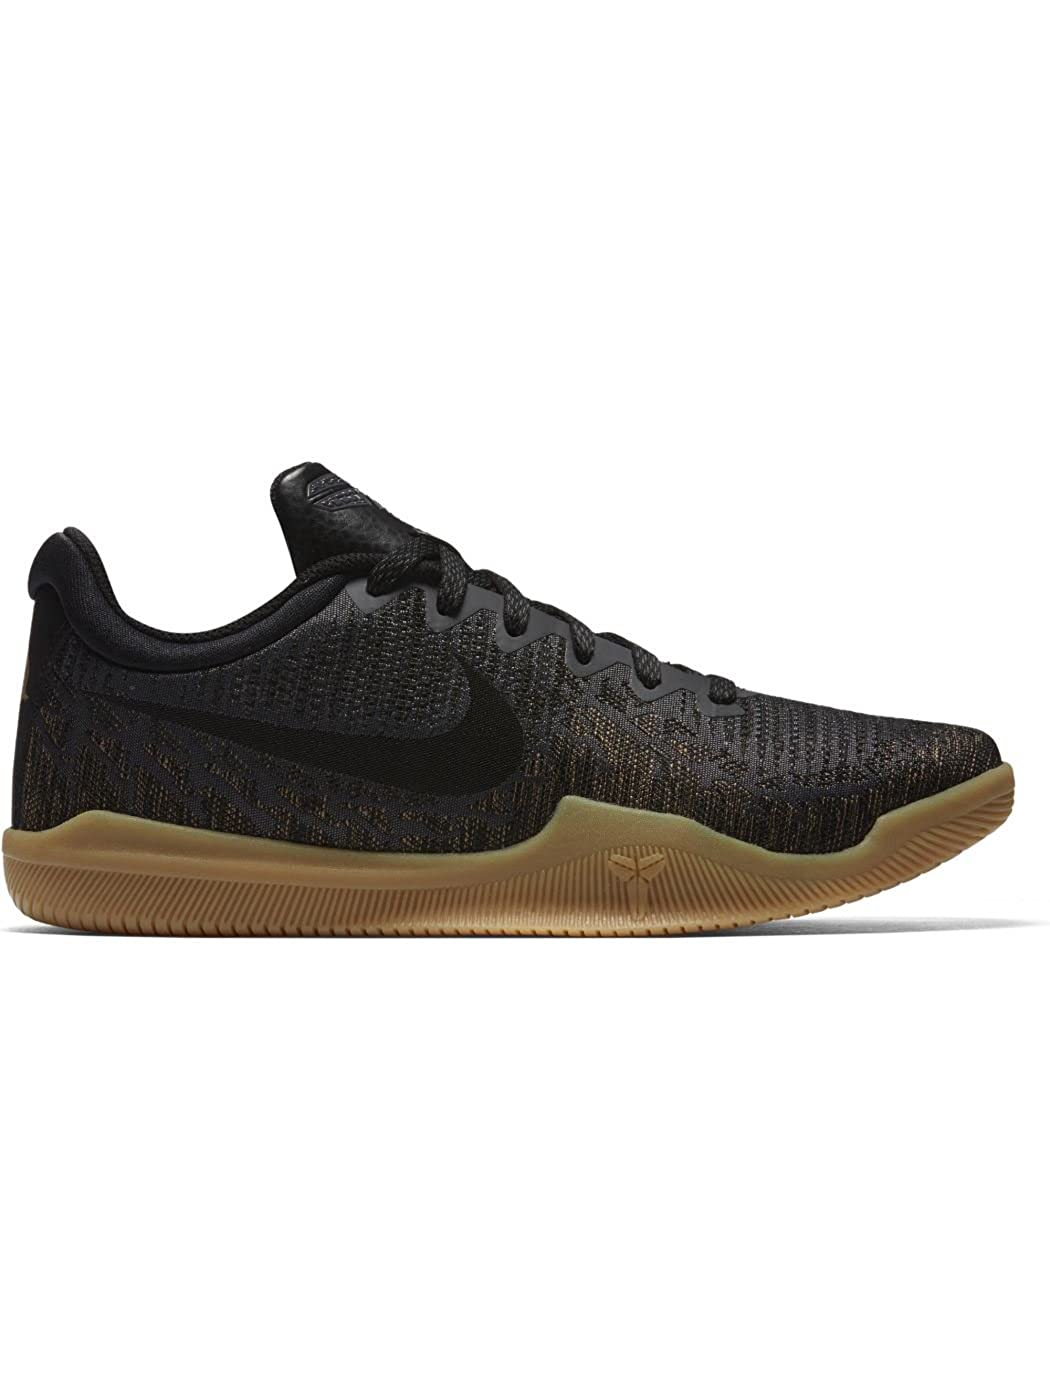 Nike Herren Mamba Rage PRM Fitnessschuhe